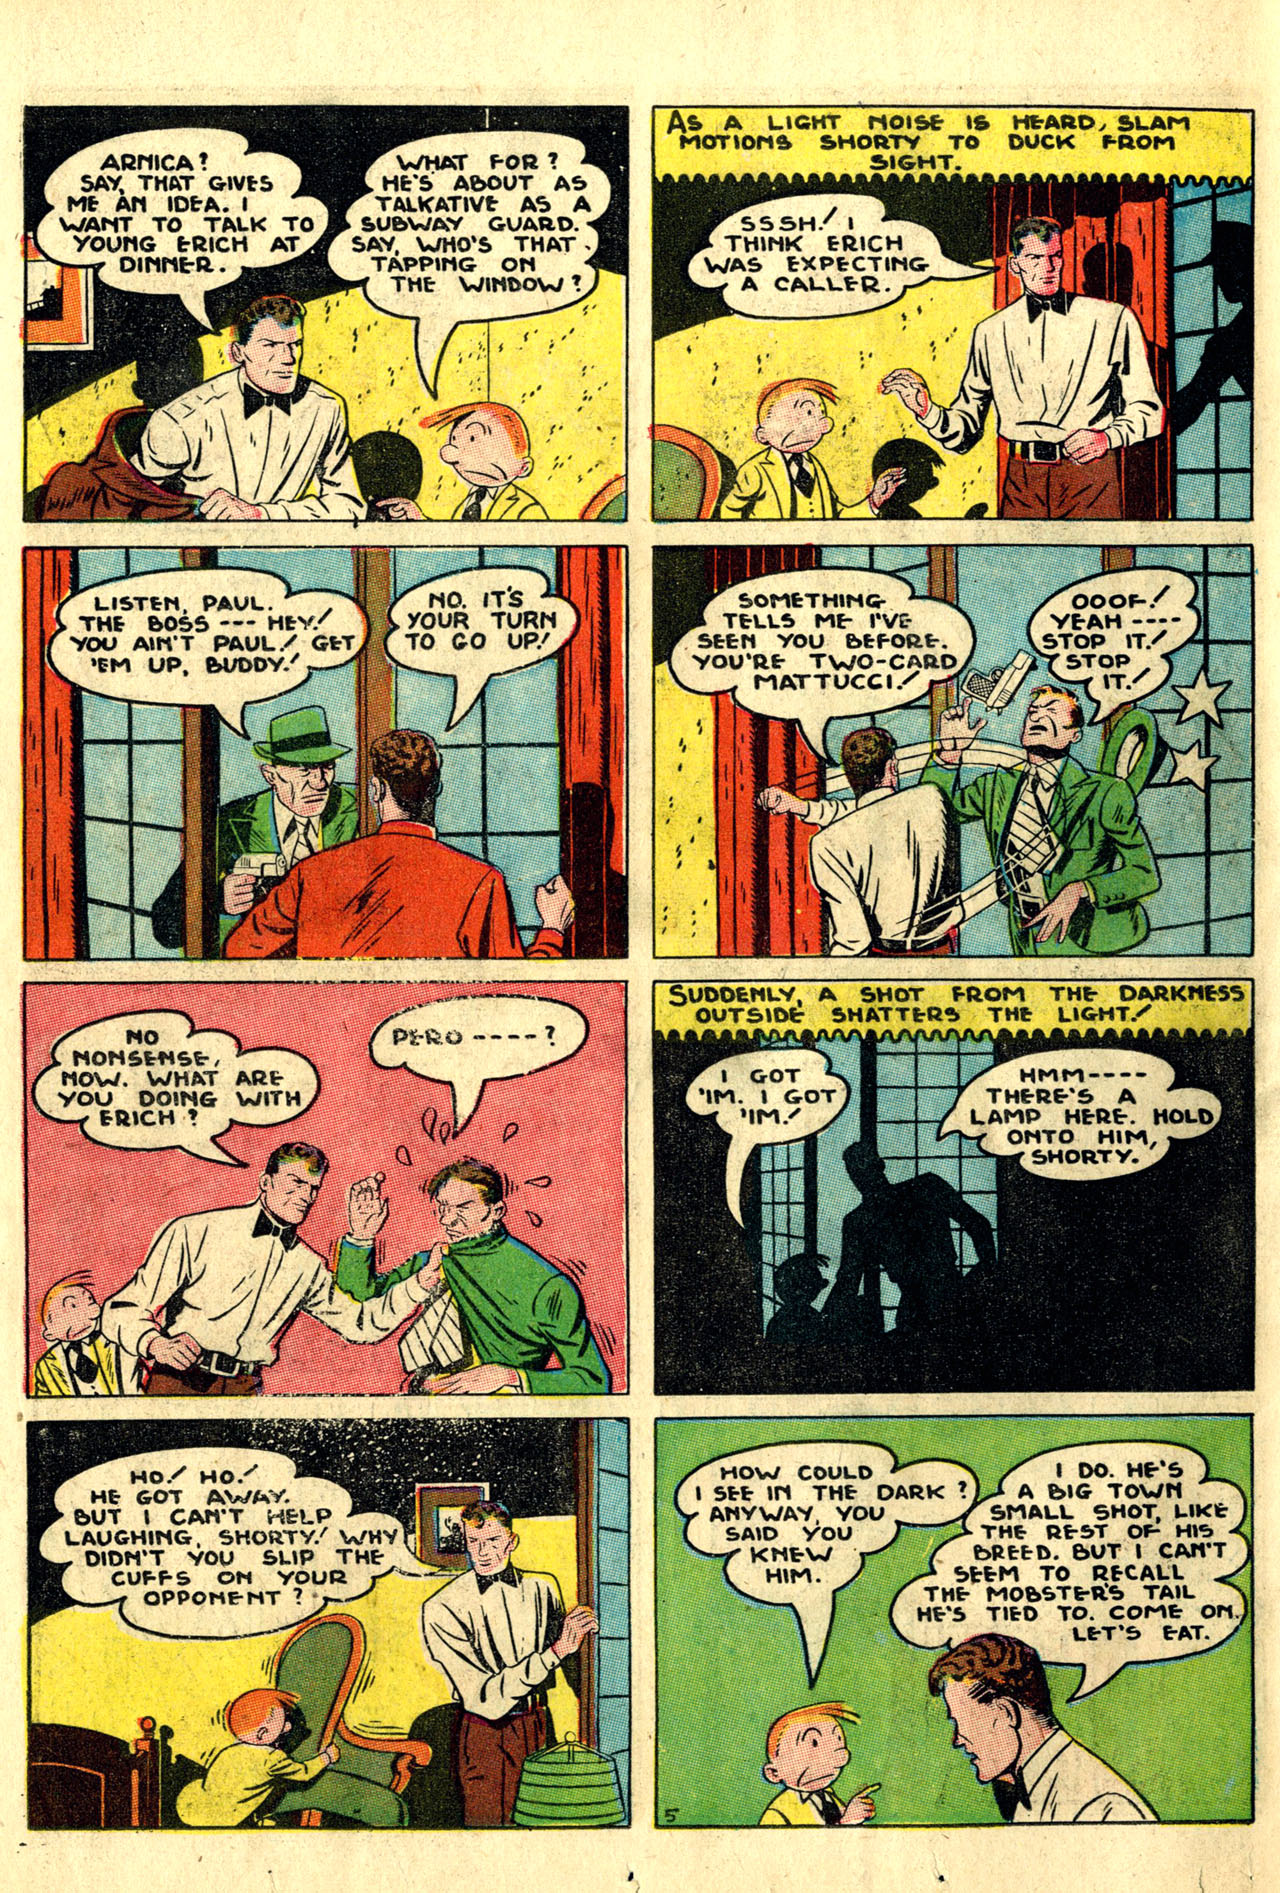 Read online Detective Comics (1937) comic -  Issue #44 - 62